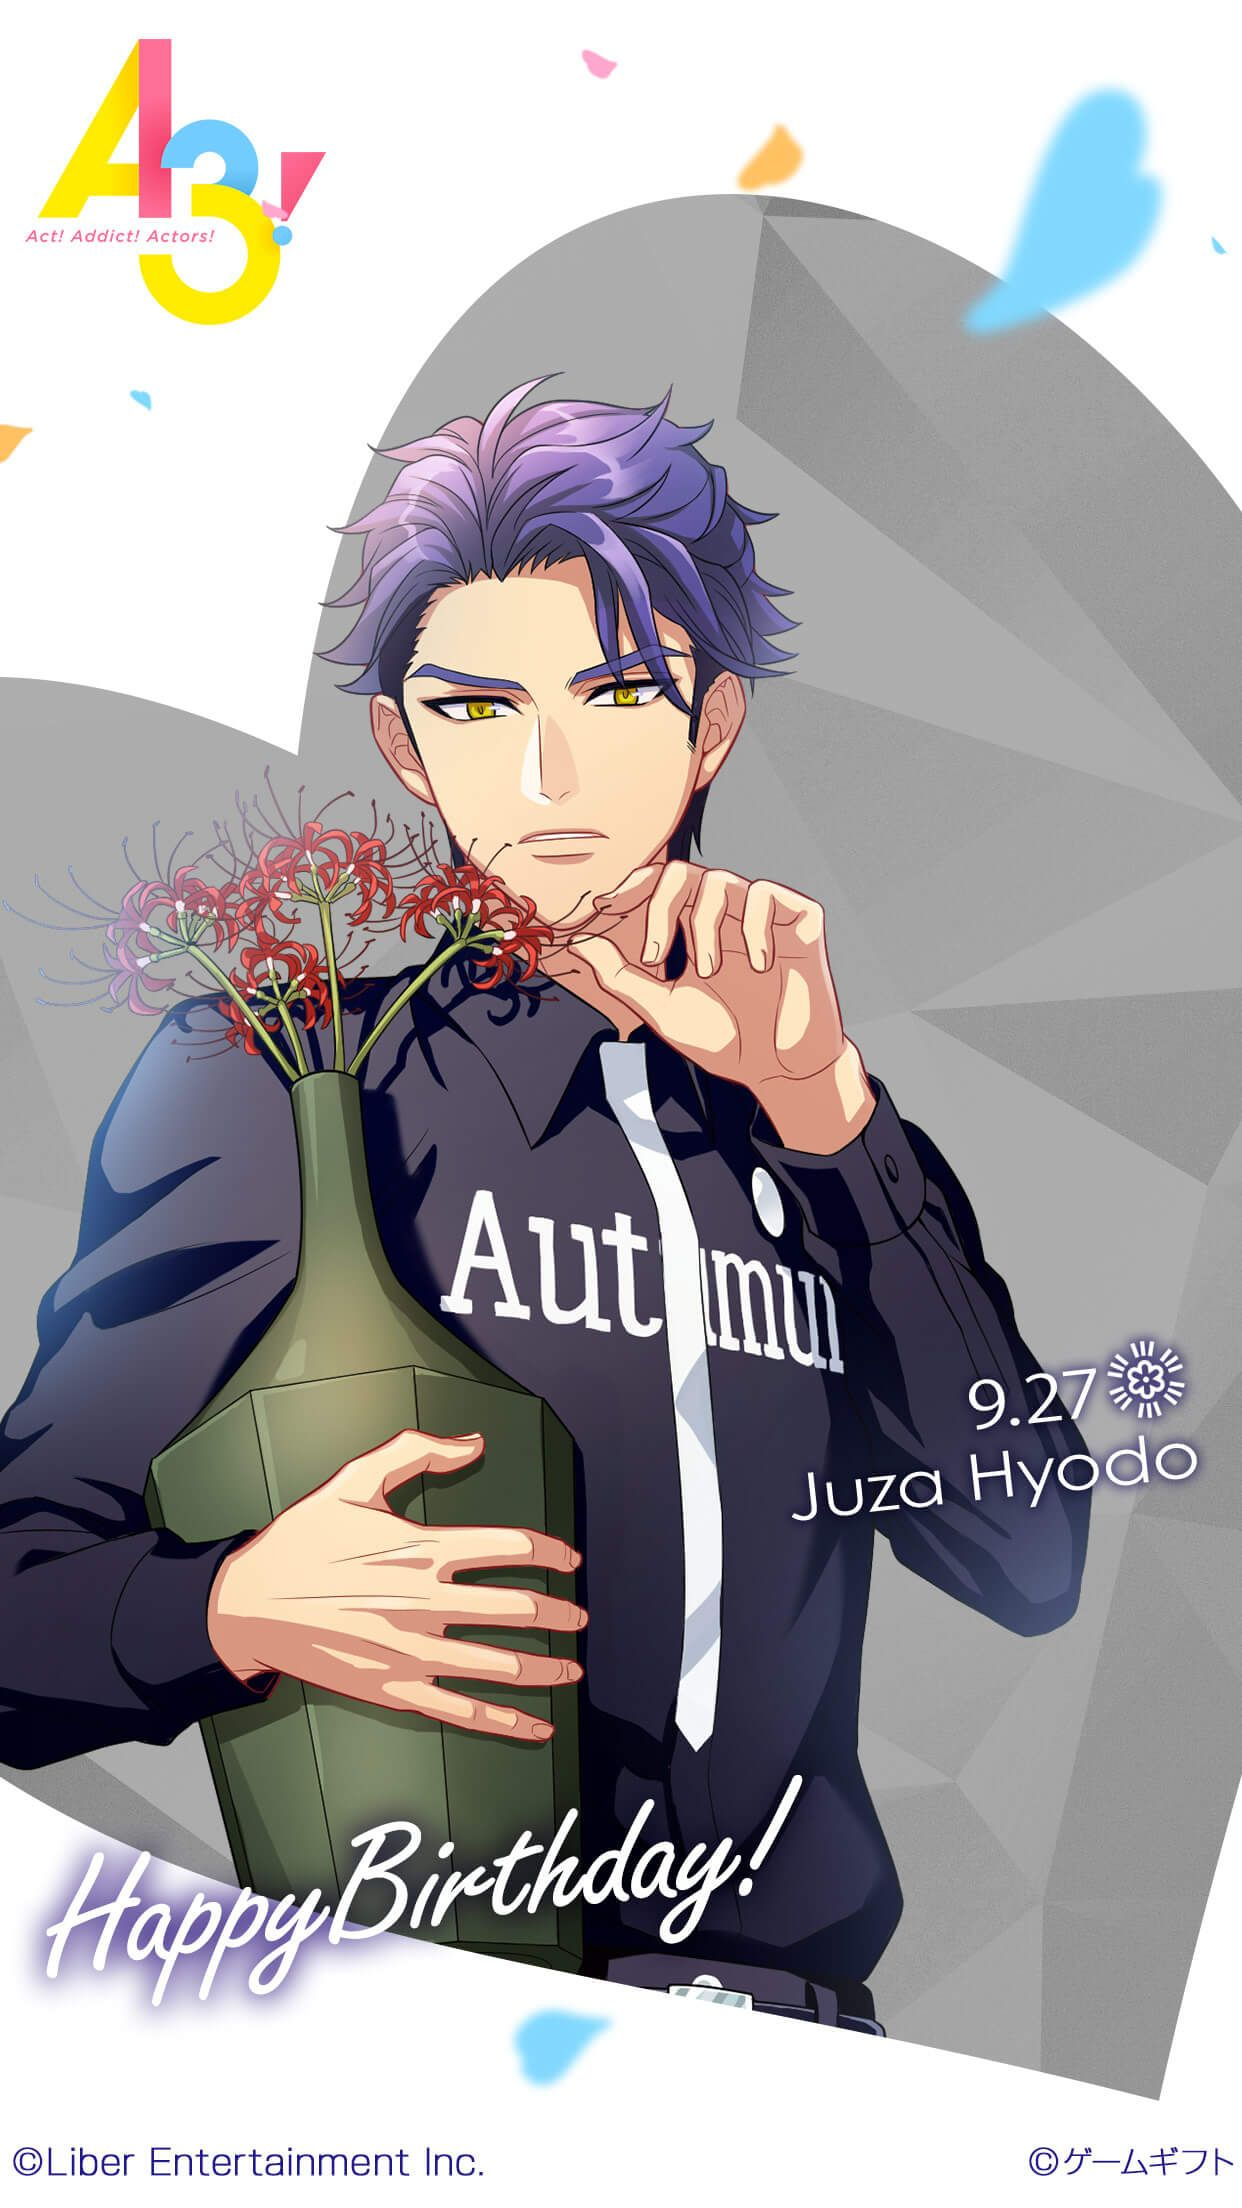 23413cdb809a0747699ff8dfb8cd0c50.jpg (1242×2208) Anime